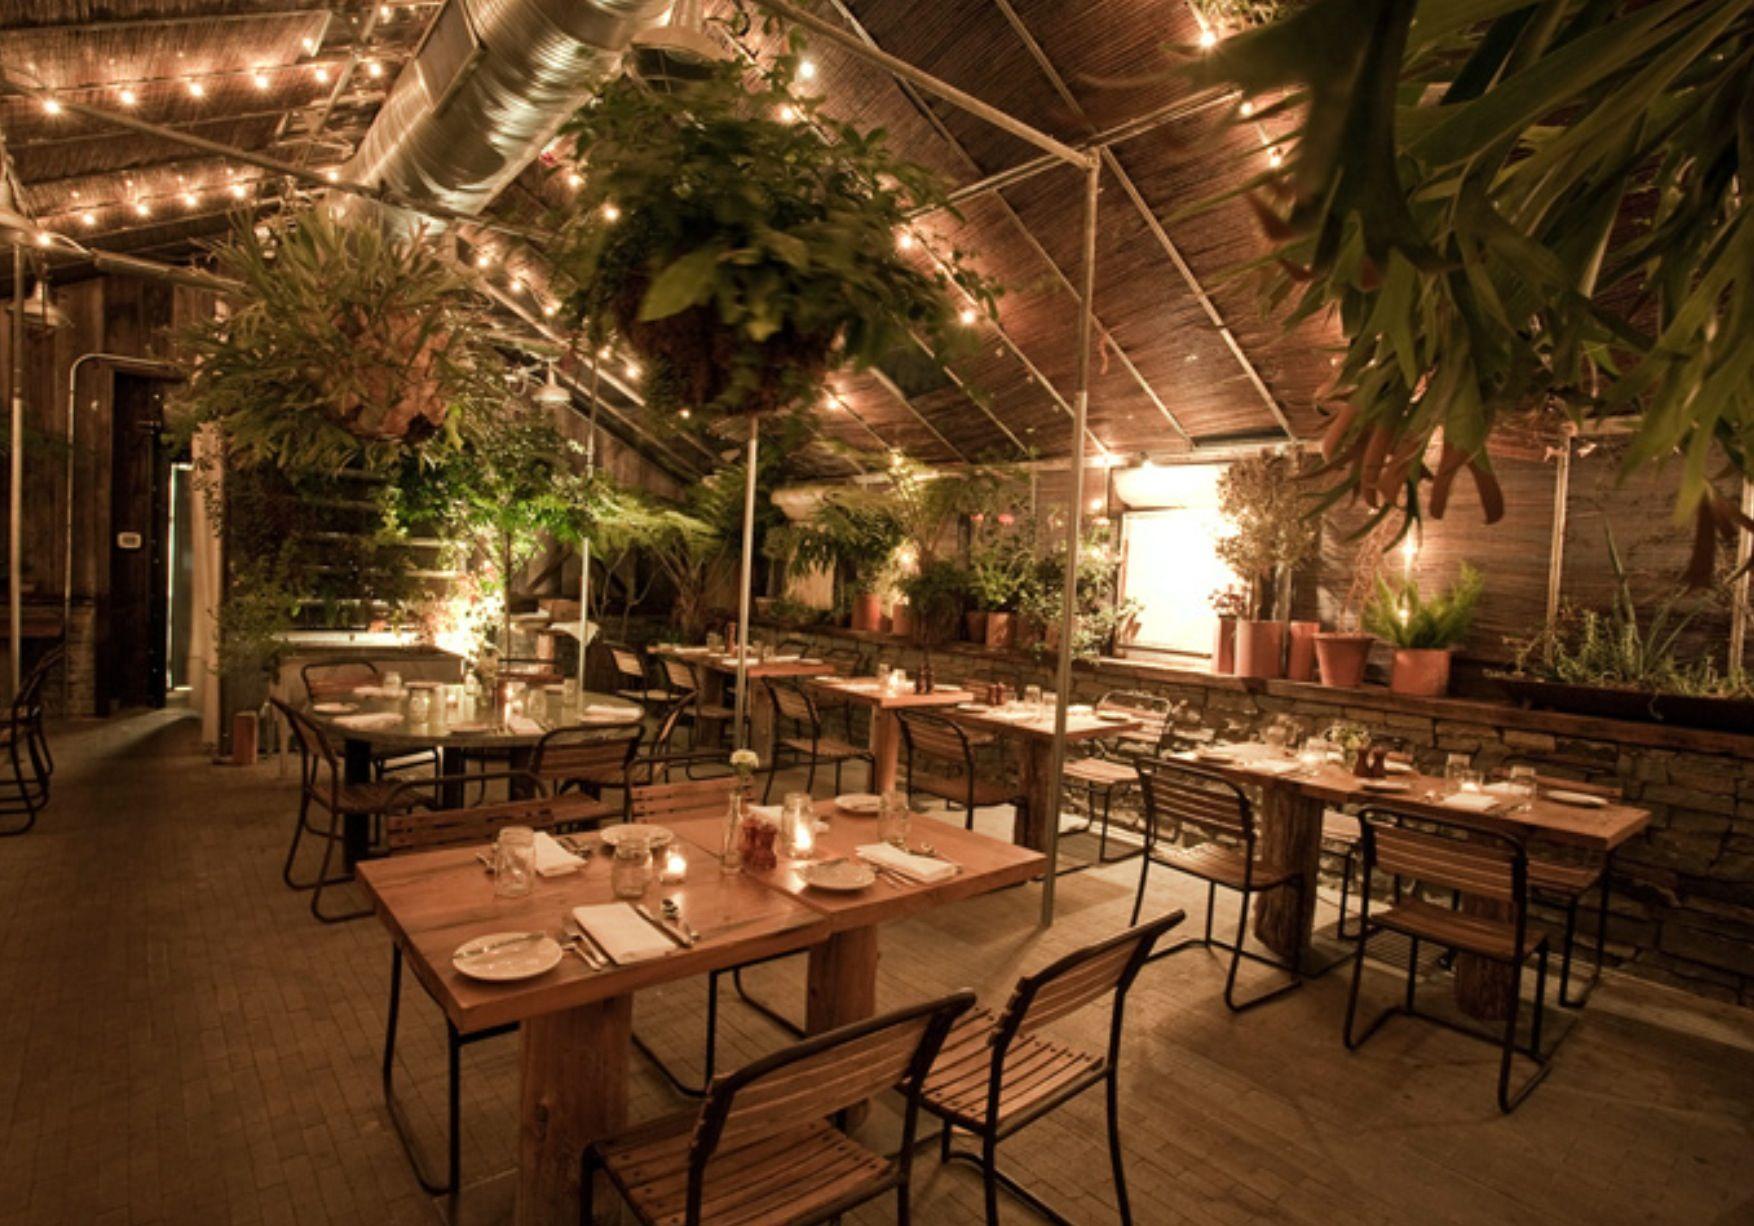 Terrain restaurant in Glen Mills, PA Garden cafe